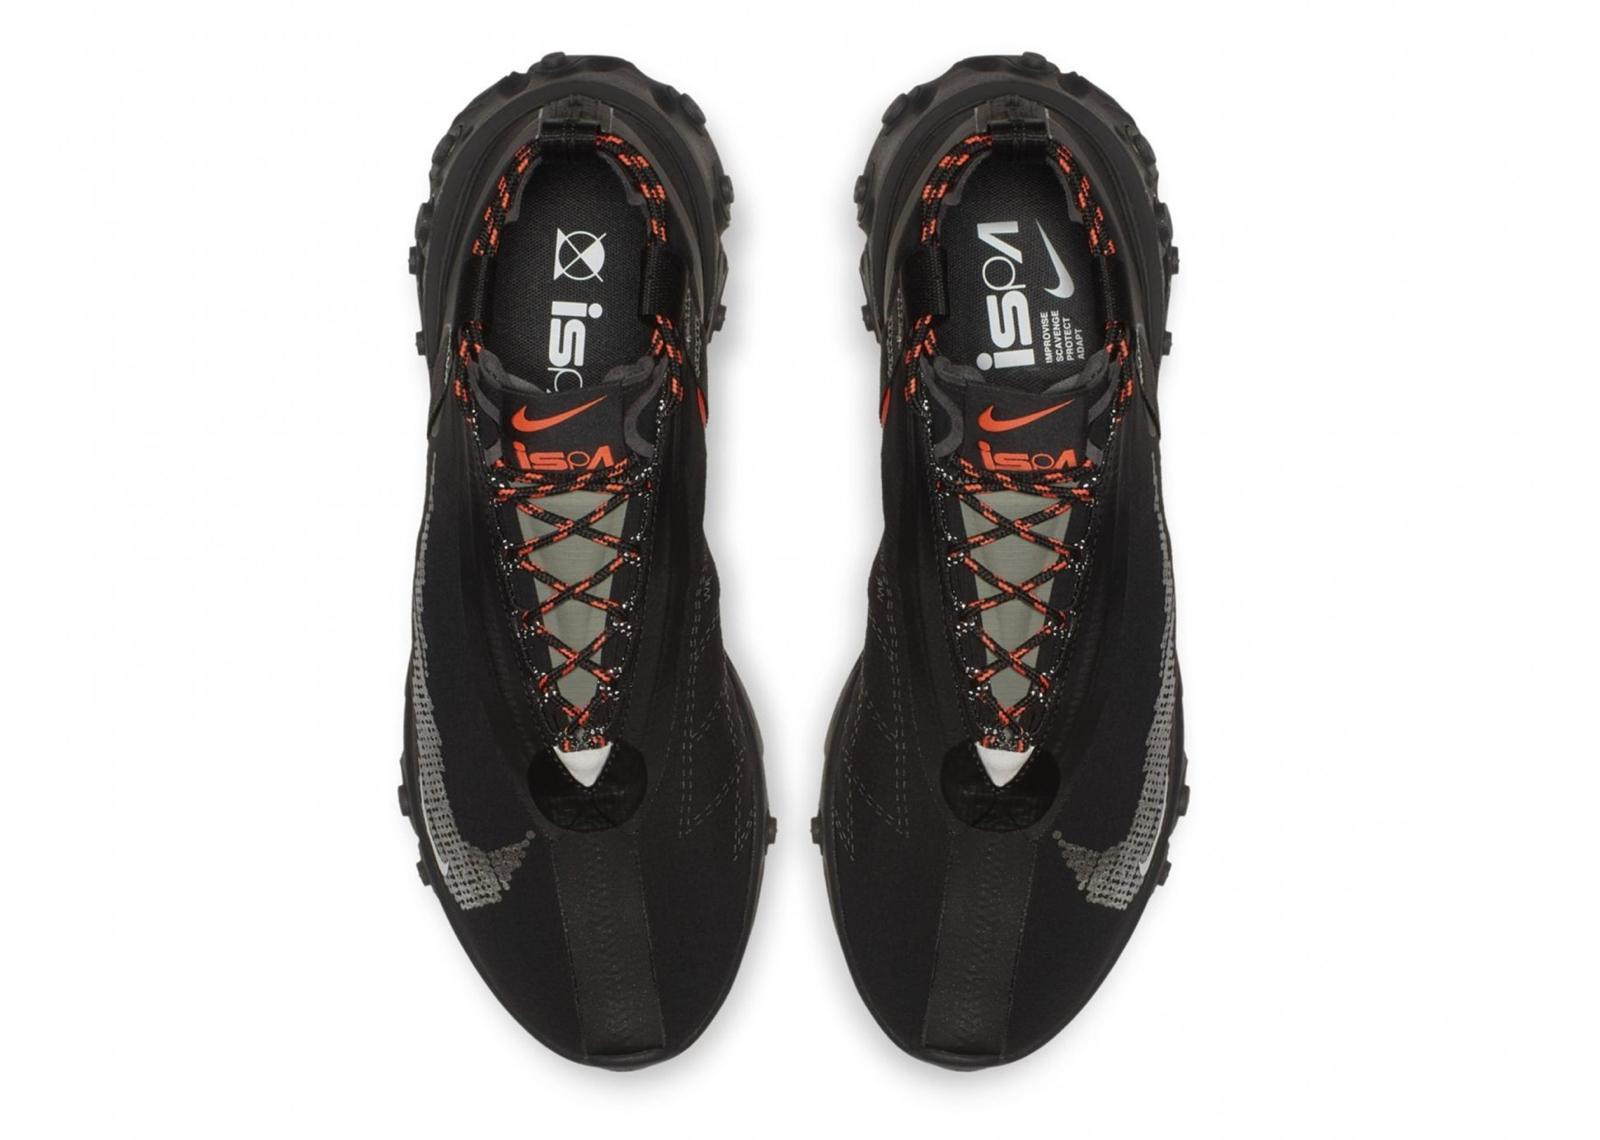 c36a12bbbe37b Nike React Runner Mid WR ISPA Black - 1